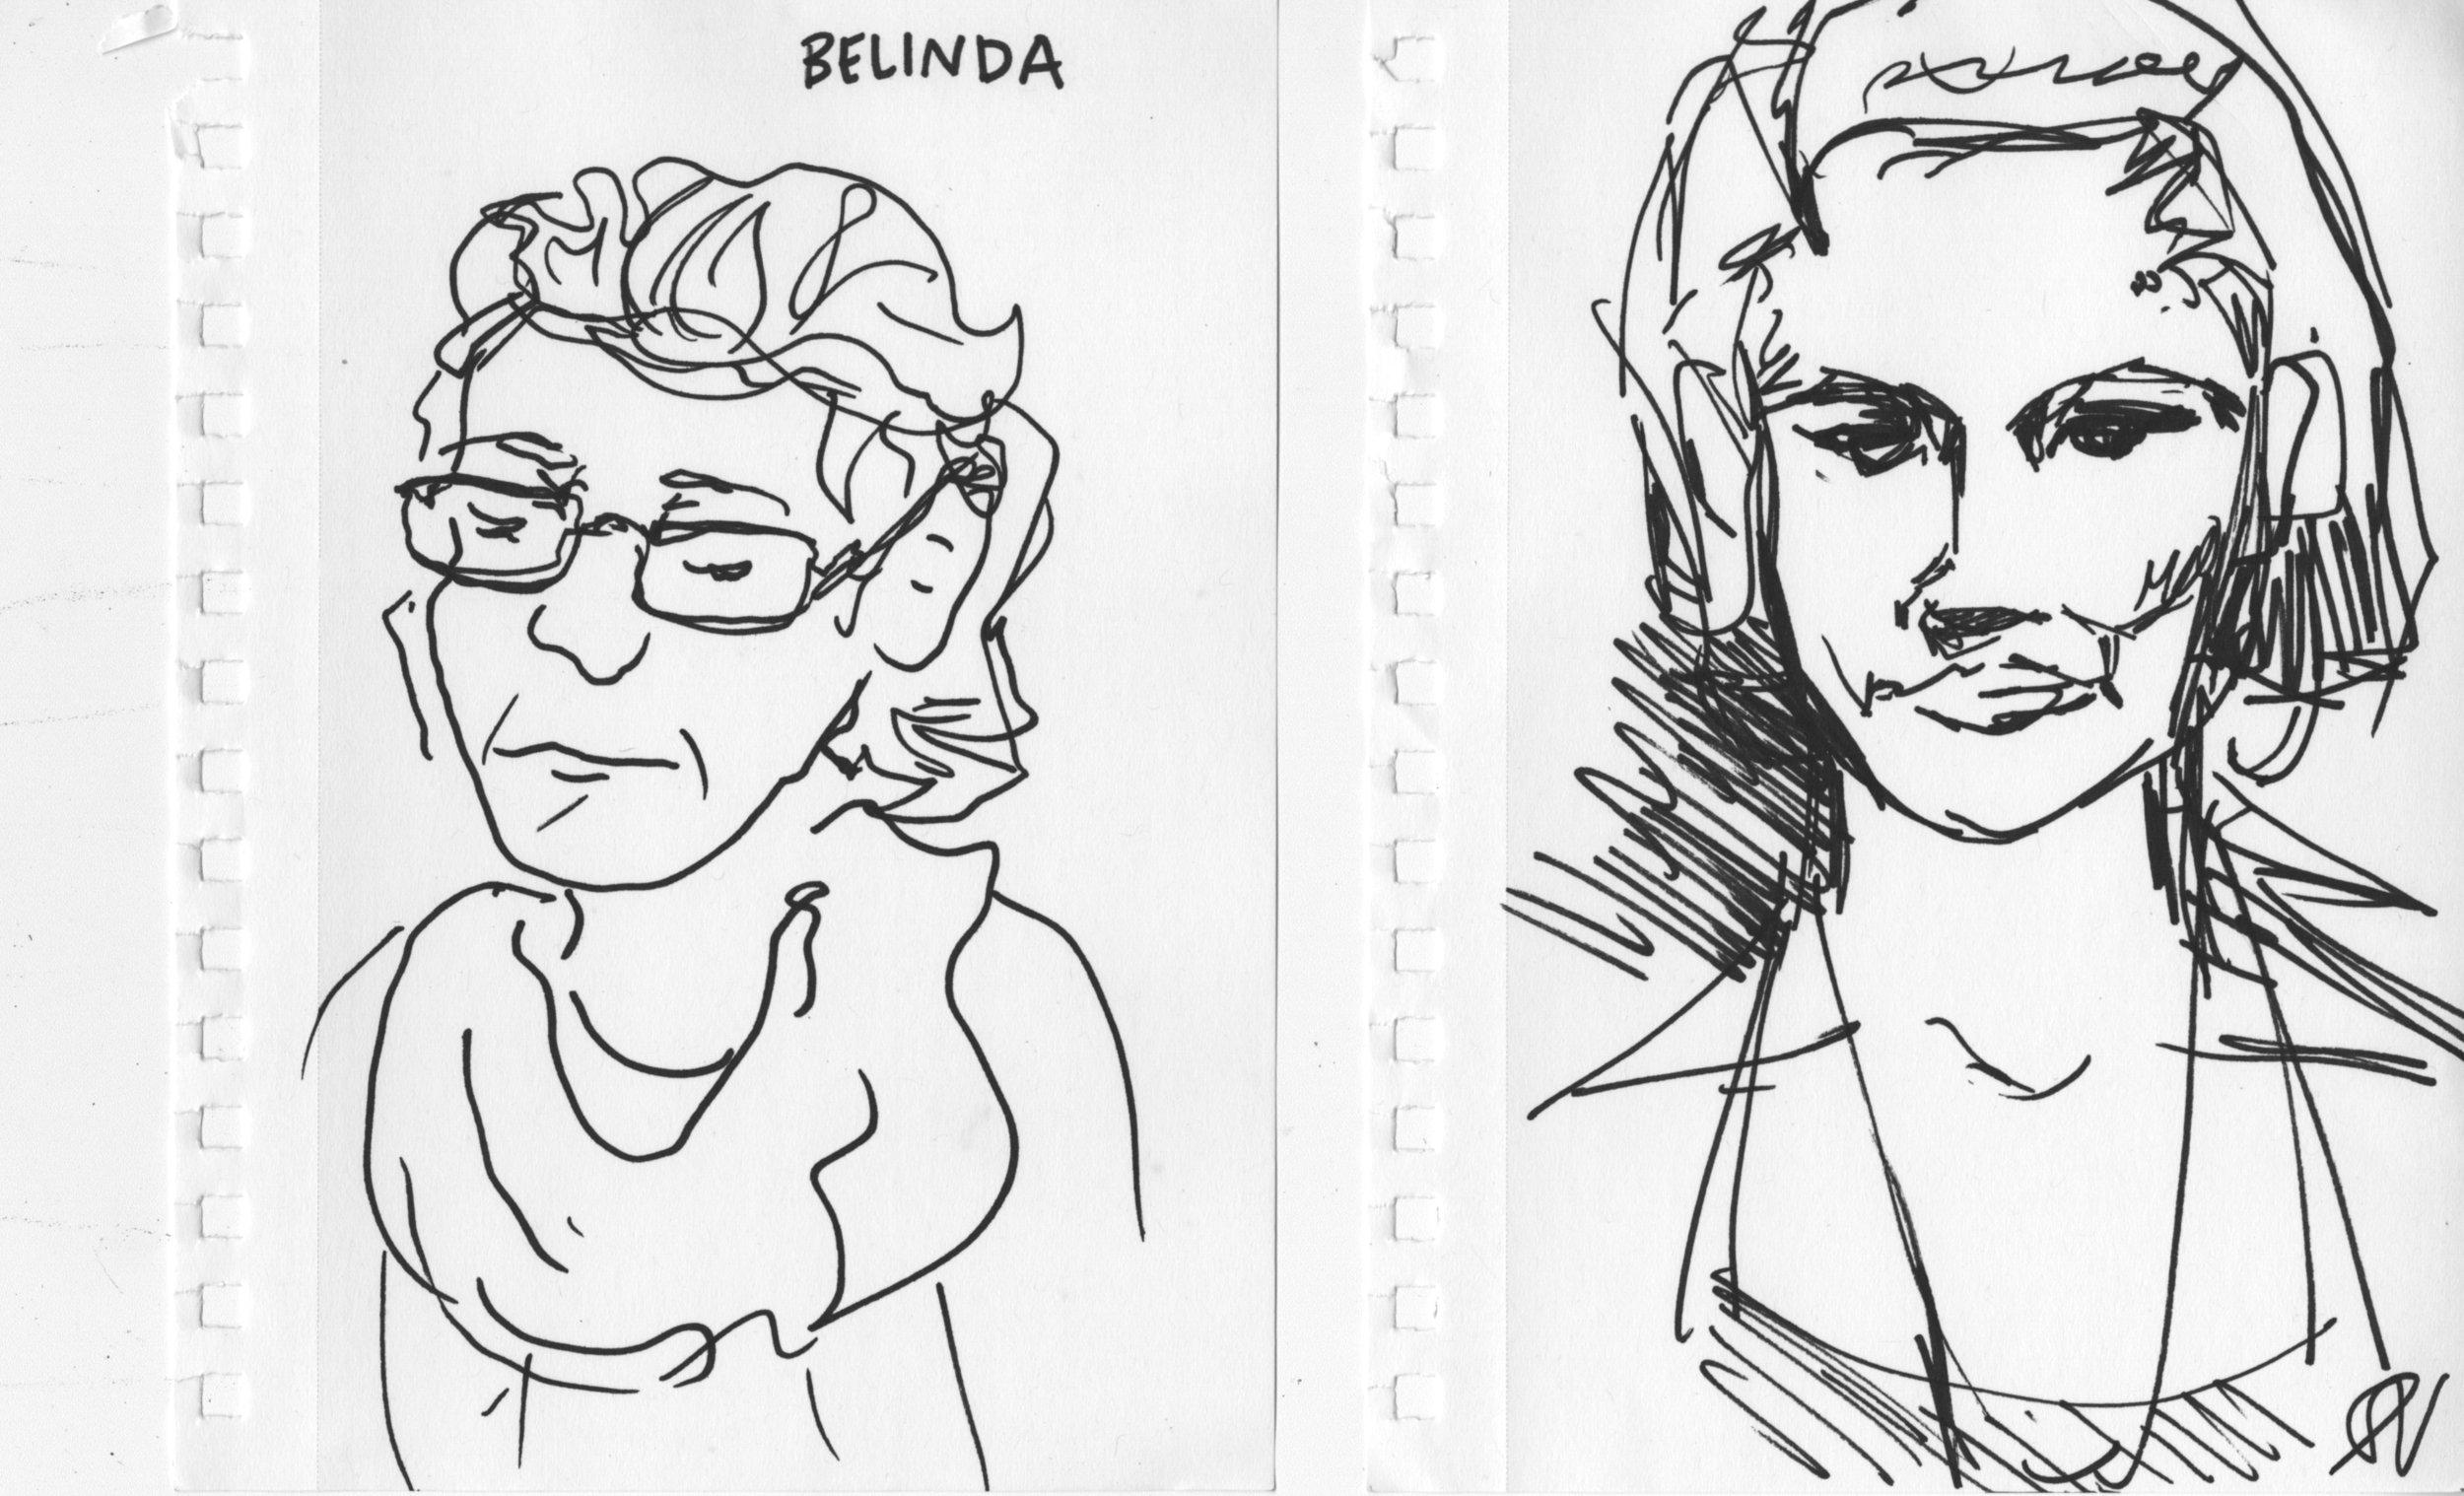 33_Belinda Vicars_Belinda.jpg